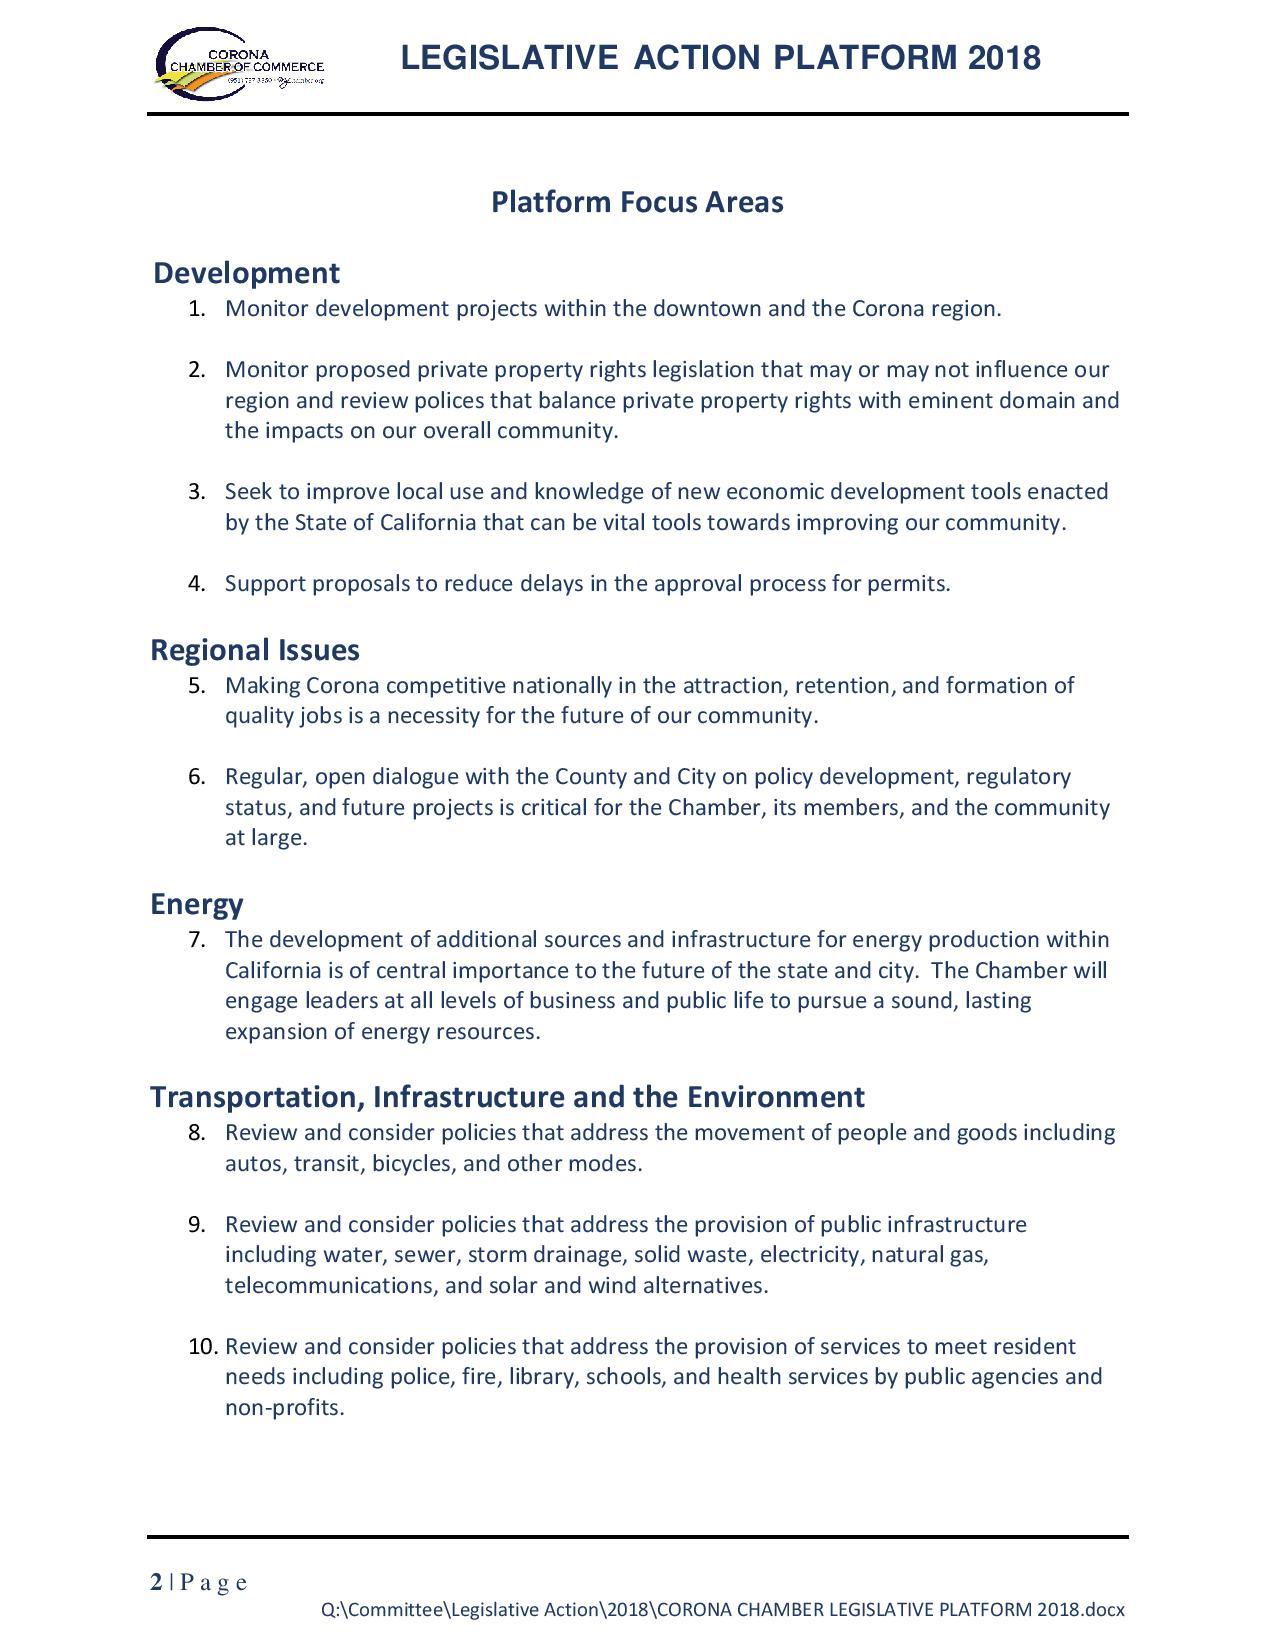 CORONA-CHAMBER-LEGISLATIVE-PLATFORM-2018-page-002.jpg